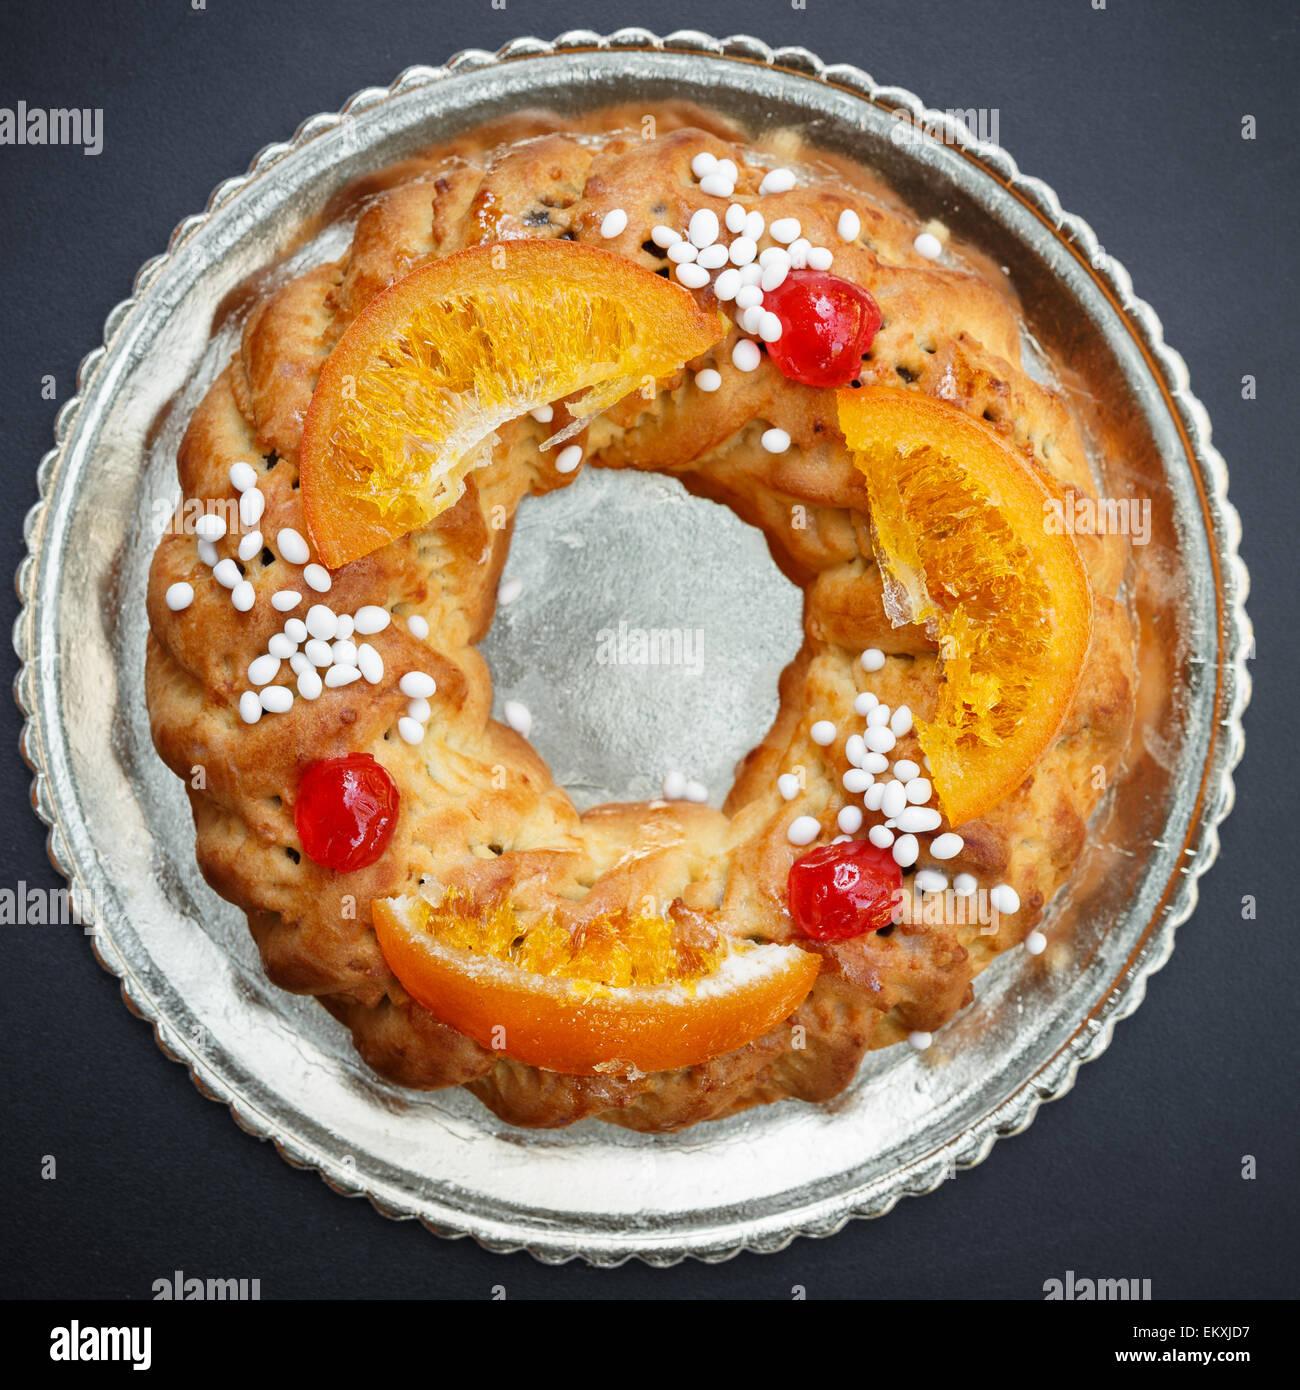 Buccellato, a Sicilian circular cake - Stock Image